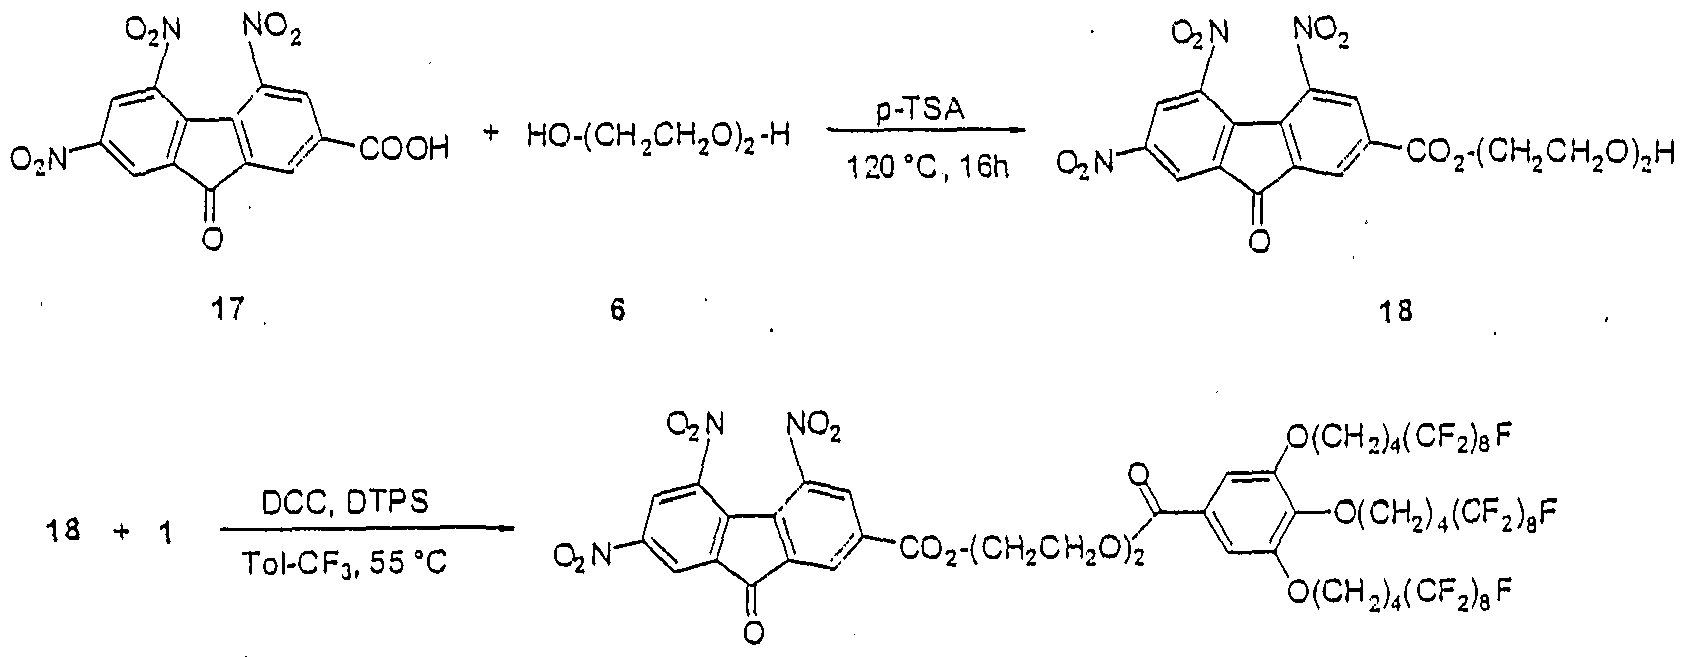 column chromatography of fluorene and fluorenone